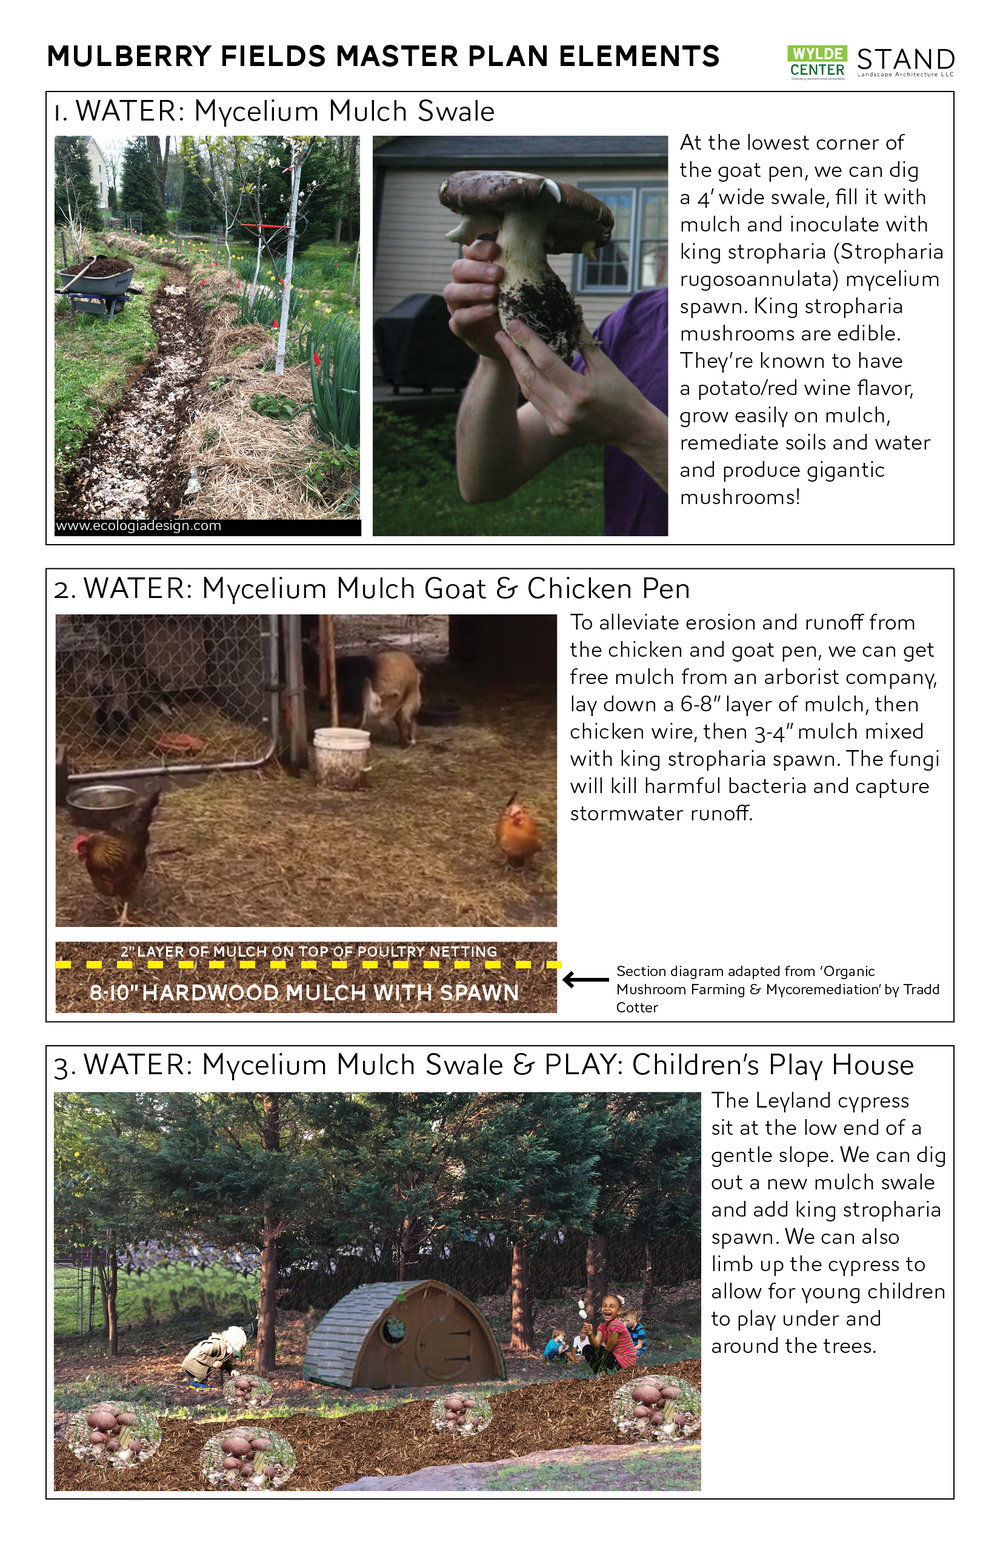 170707_MulberryFieldsMasterPlan-med-2.jpg